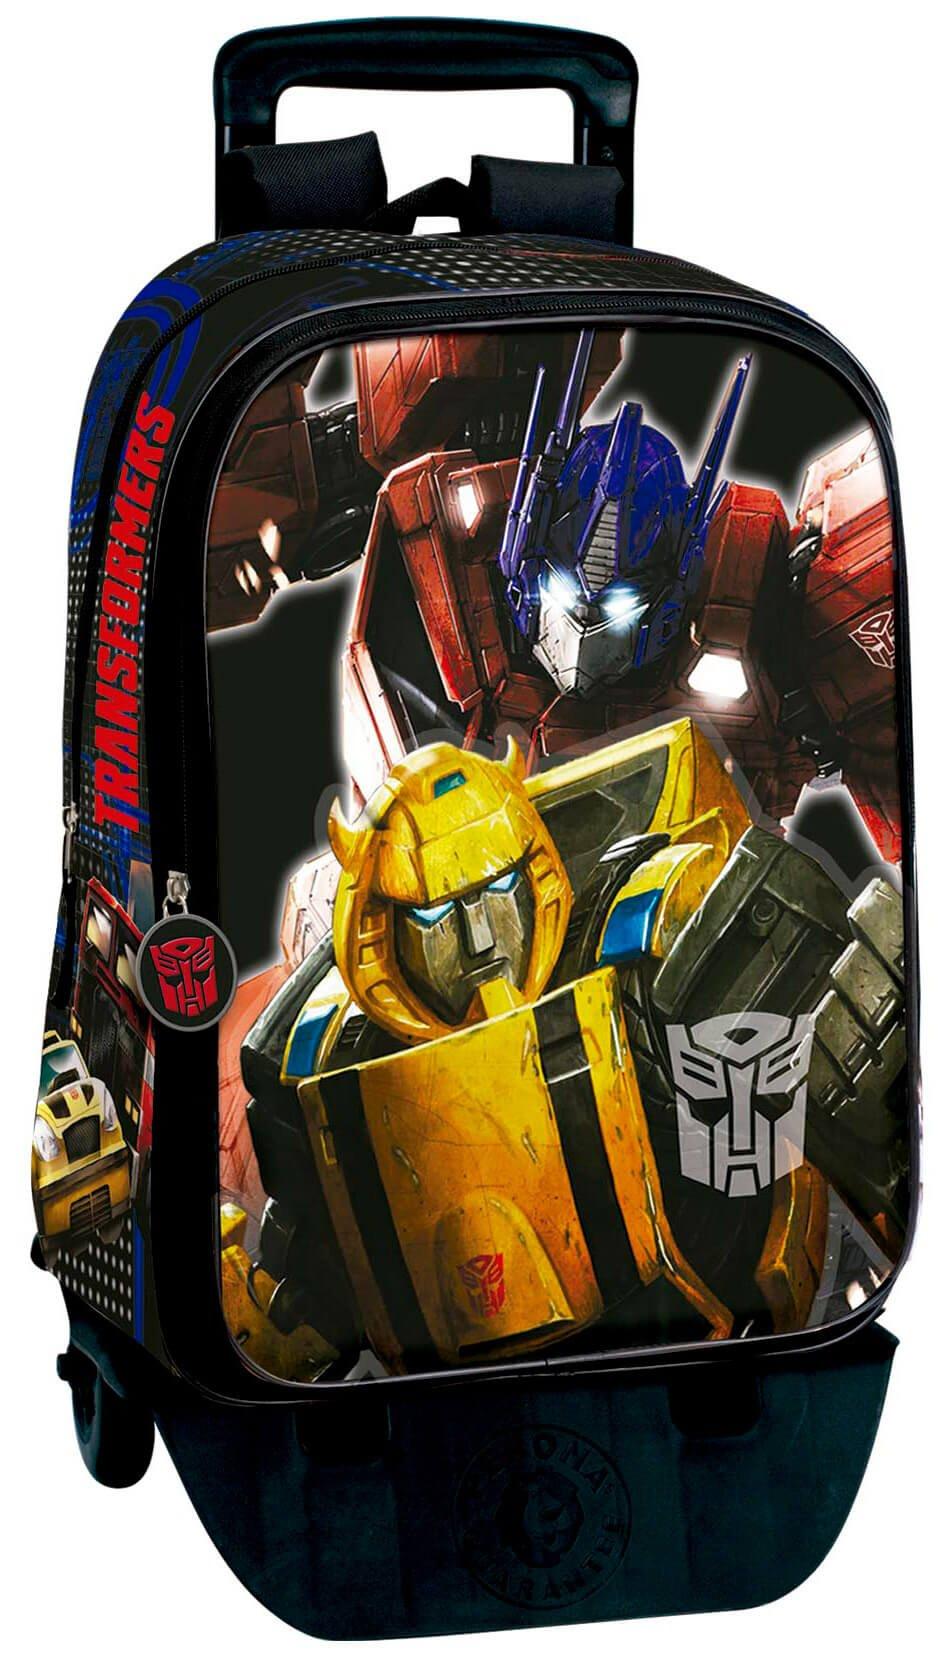 71Aw9%2B34grL - Transformers Mochila con Carro Plegable, Ruedas, Trolley